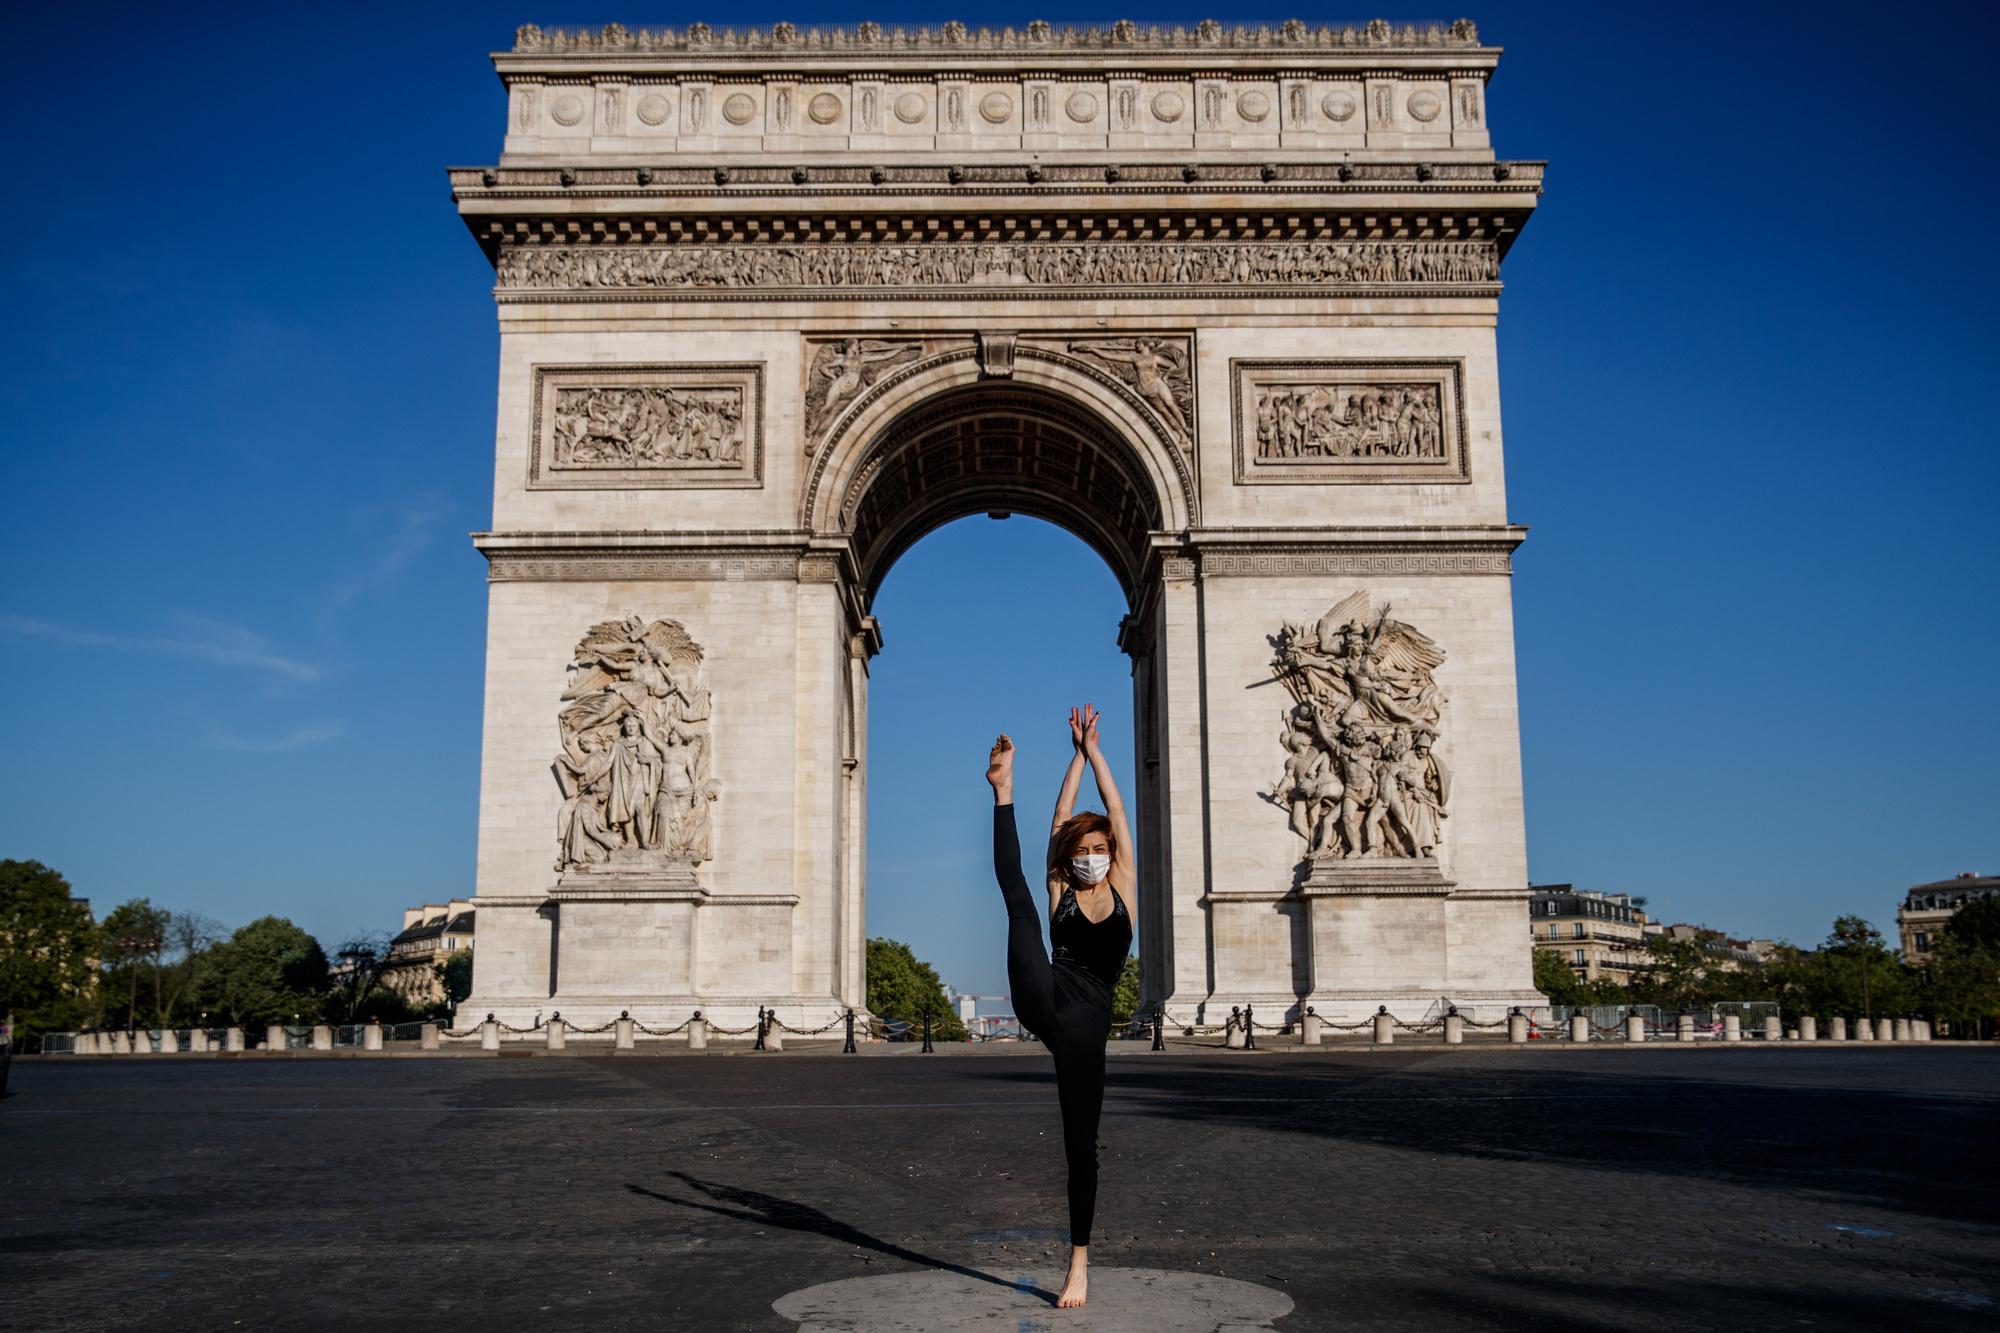 Yara al-Hasbani devant l'Arc de Triomphe, belga